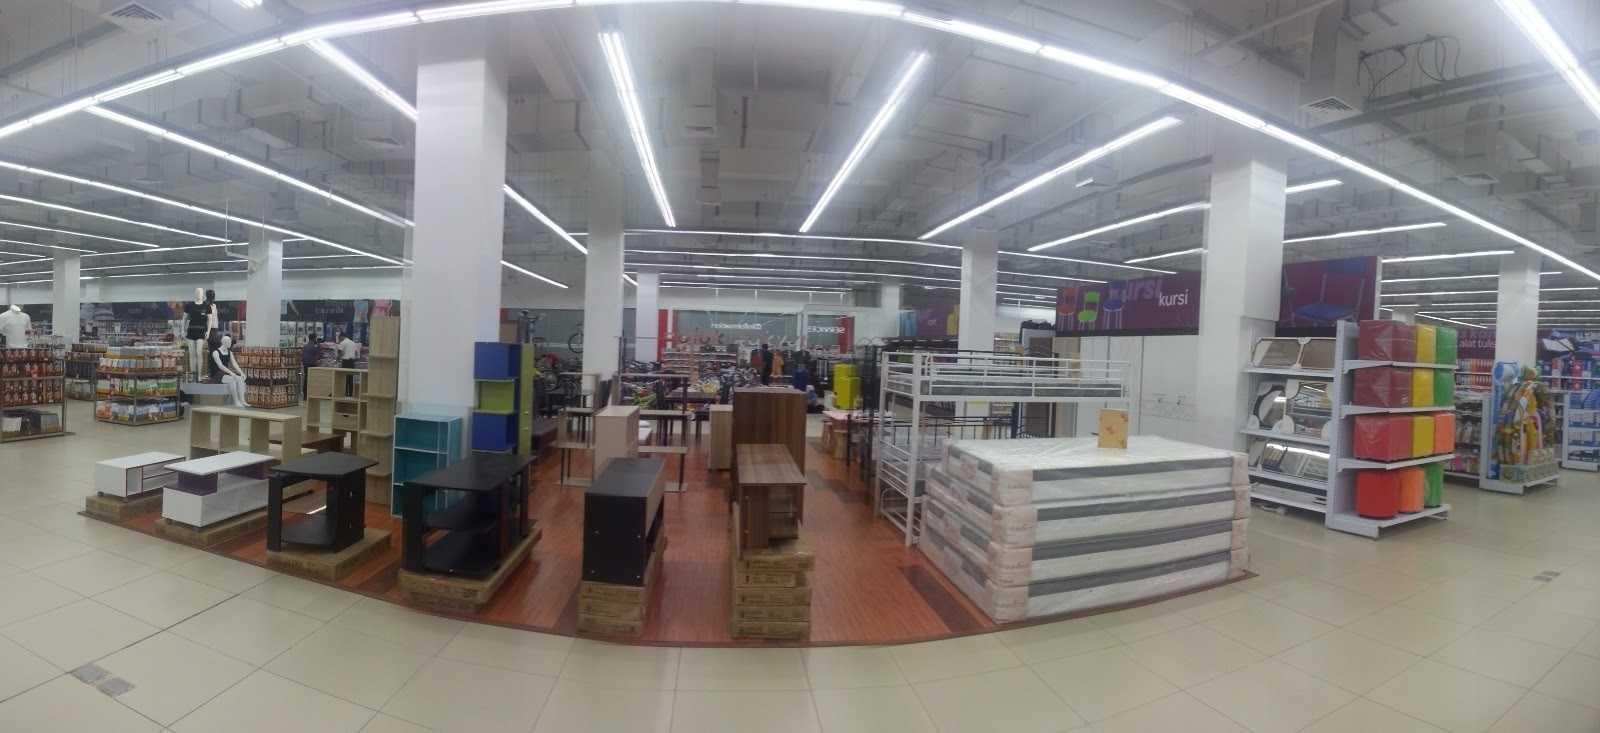 Aditio's Build And Design Transmart Cempaka Putih, Central Jakarta City, Jakarta, Indonesia Cempaka Putih, Central Jakarta City, Jakarta, Indonesia Img-20160129-Wa0056 Industrial  36280